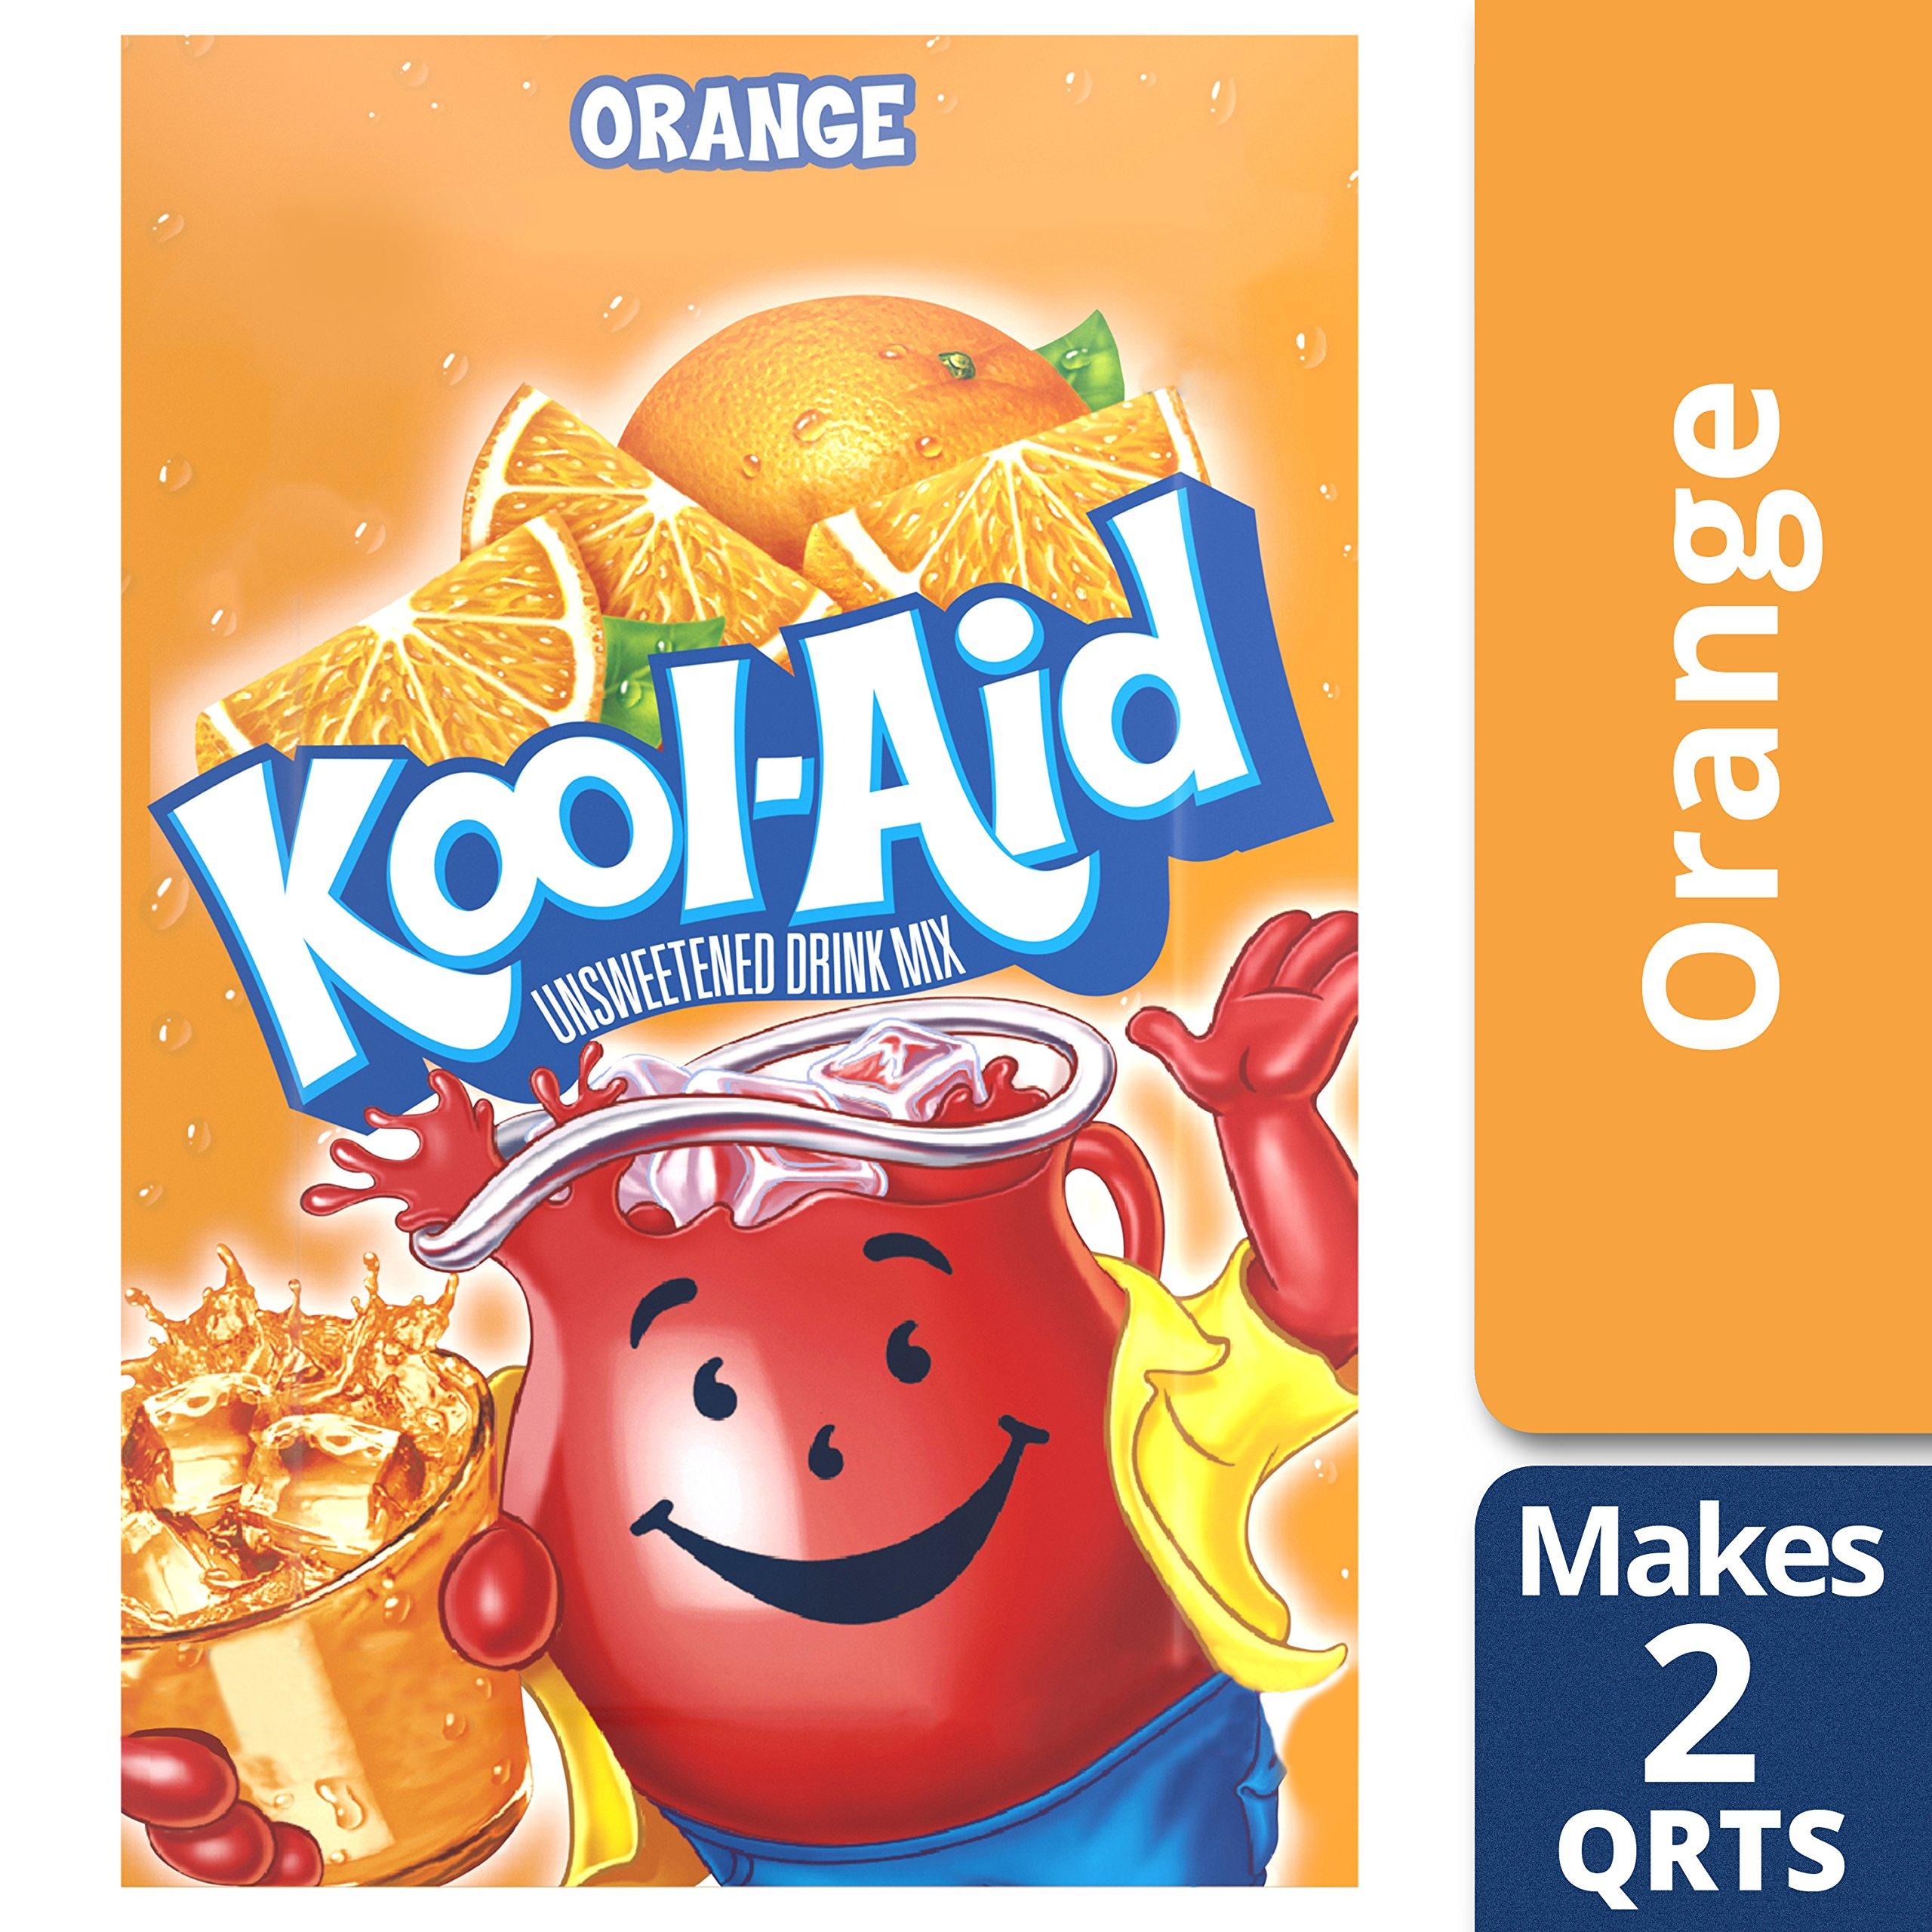 Kool-Aid Unsweetened Orange Powdered Drink Mix, 0.14 oz Packet